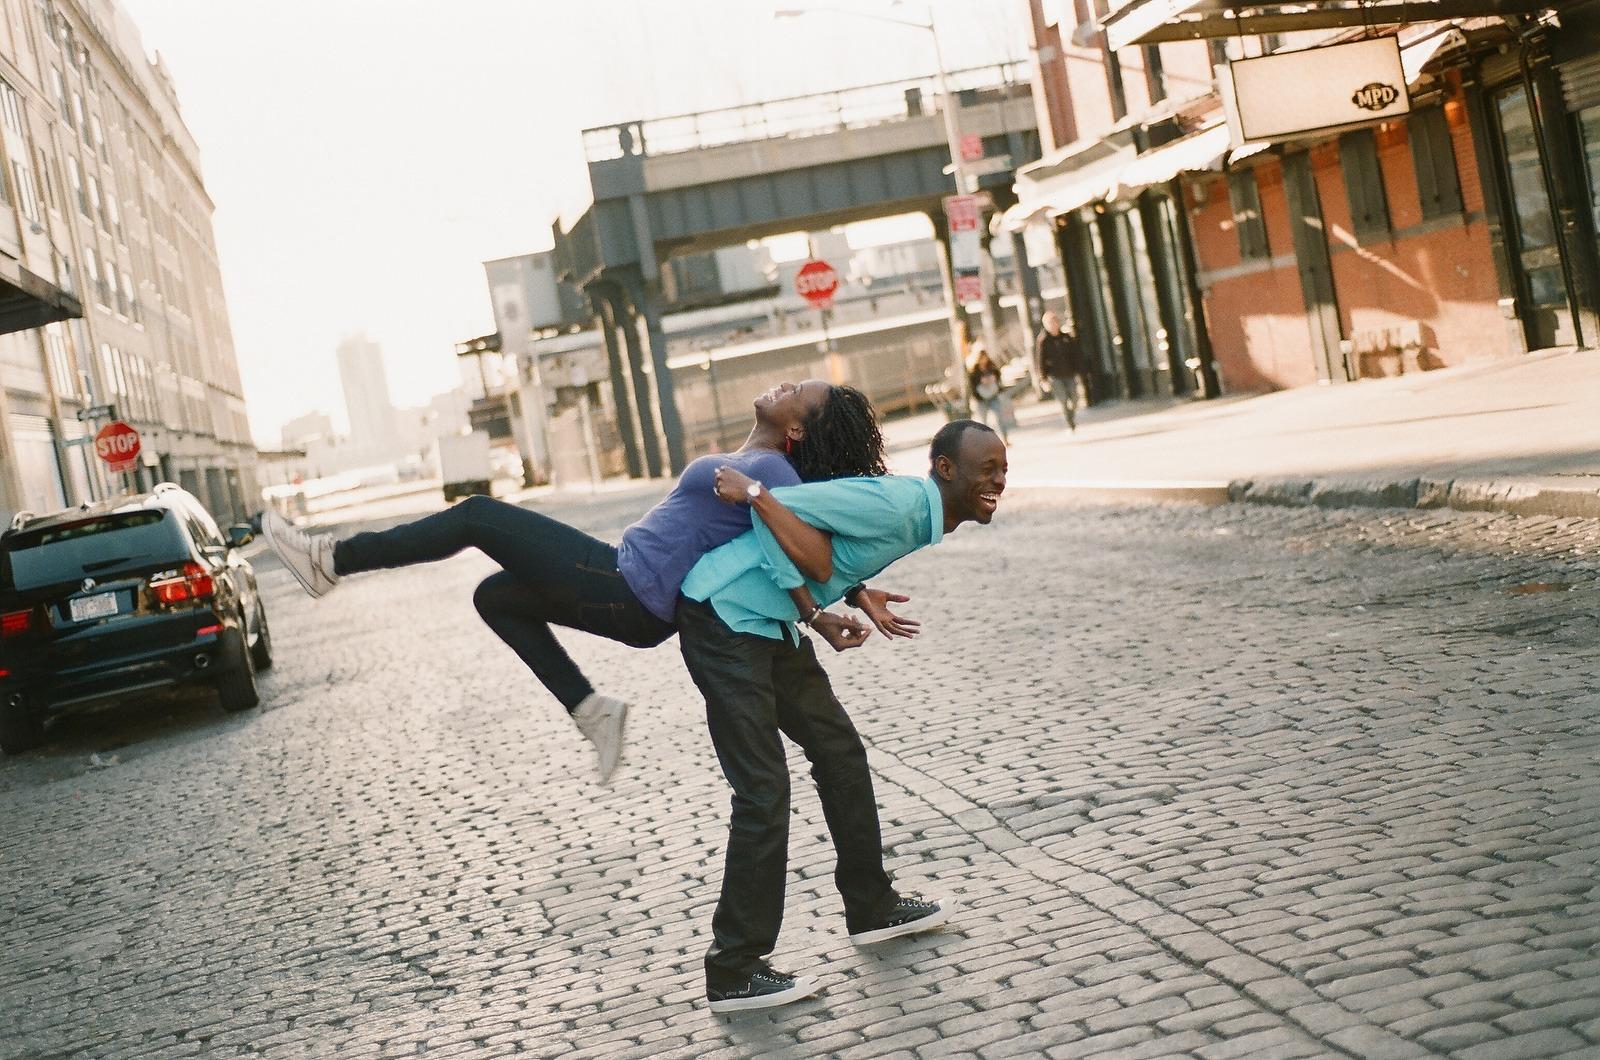 groom holding bride on his back cobblestone street